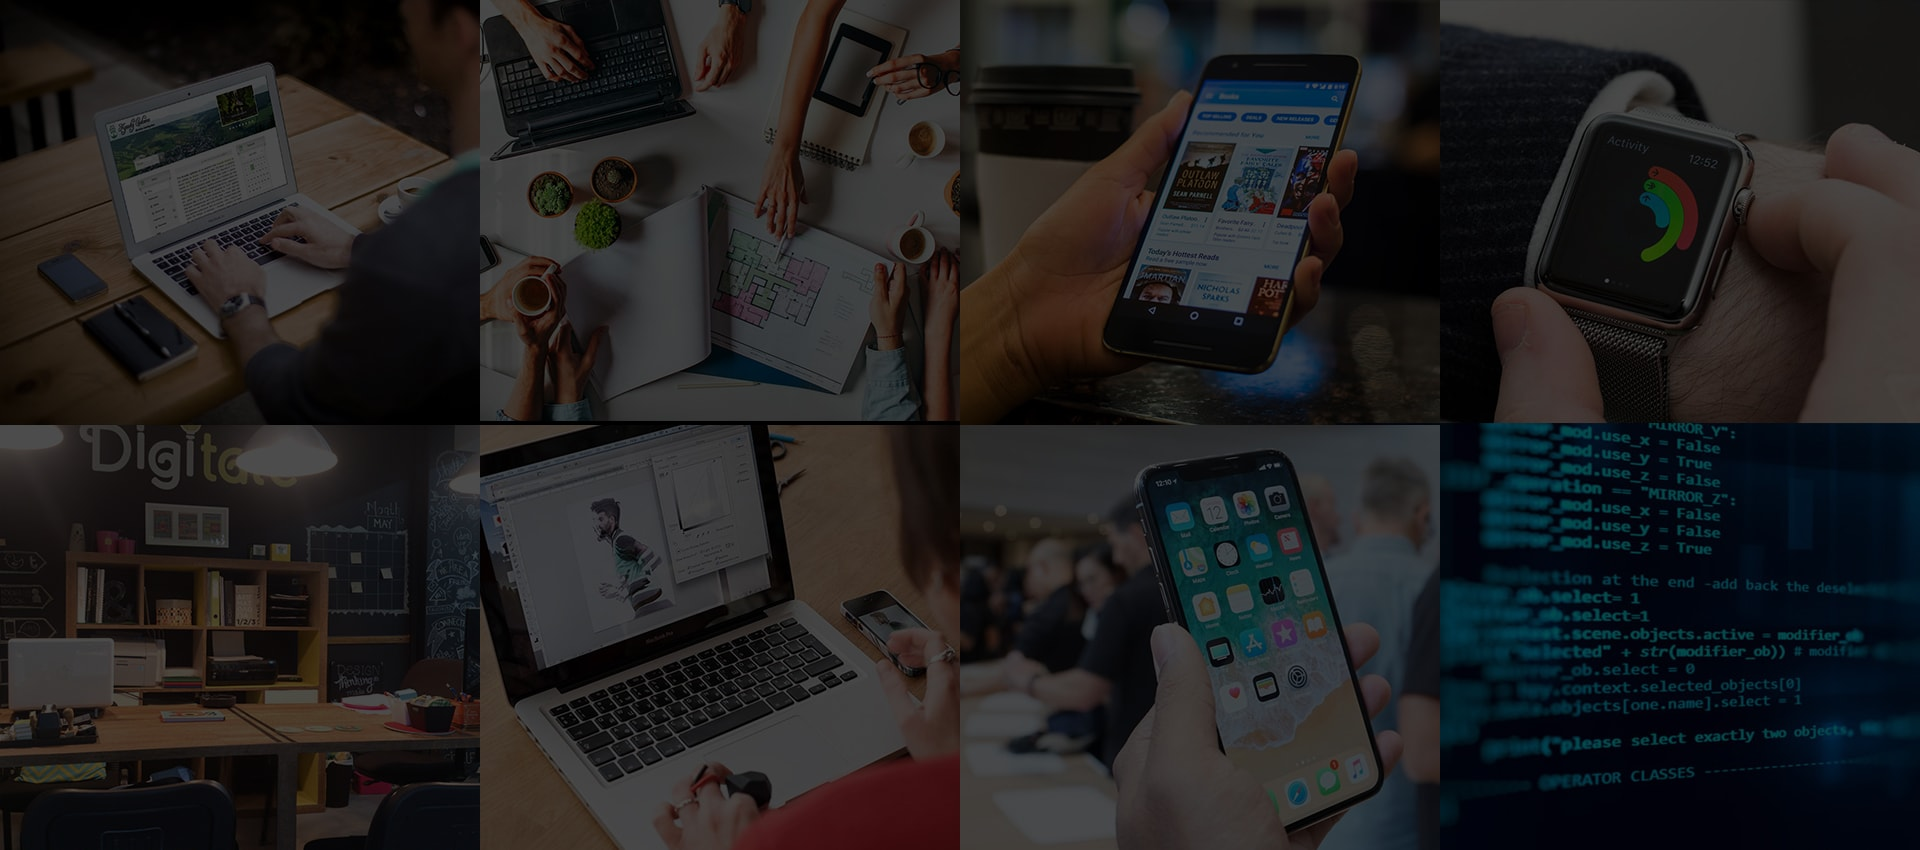 Top Mobile app Development Company in Gurgaon, India & Australia